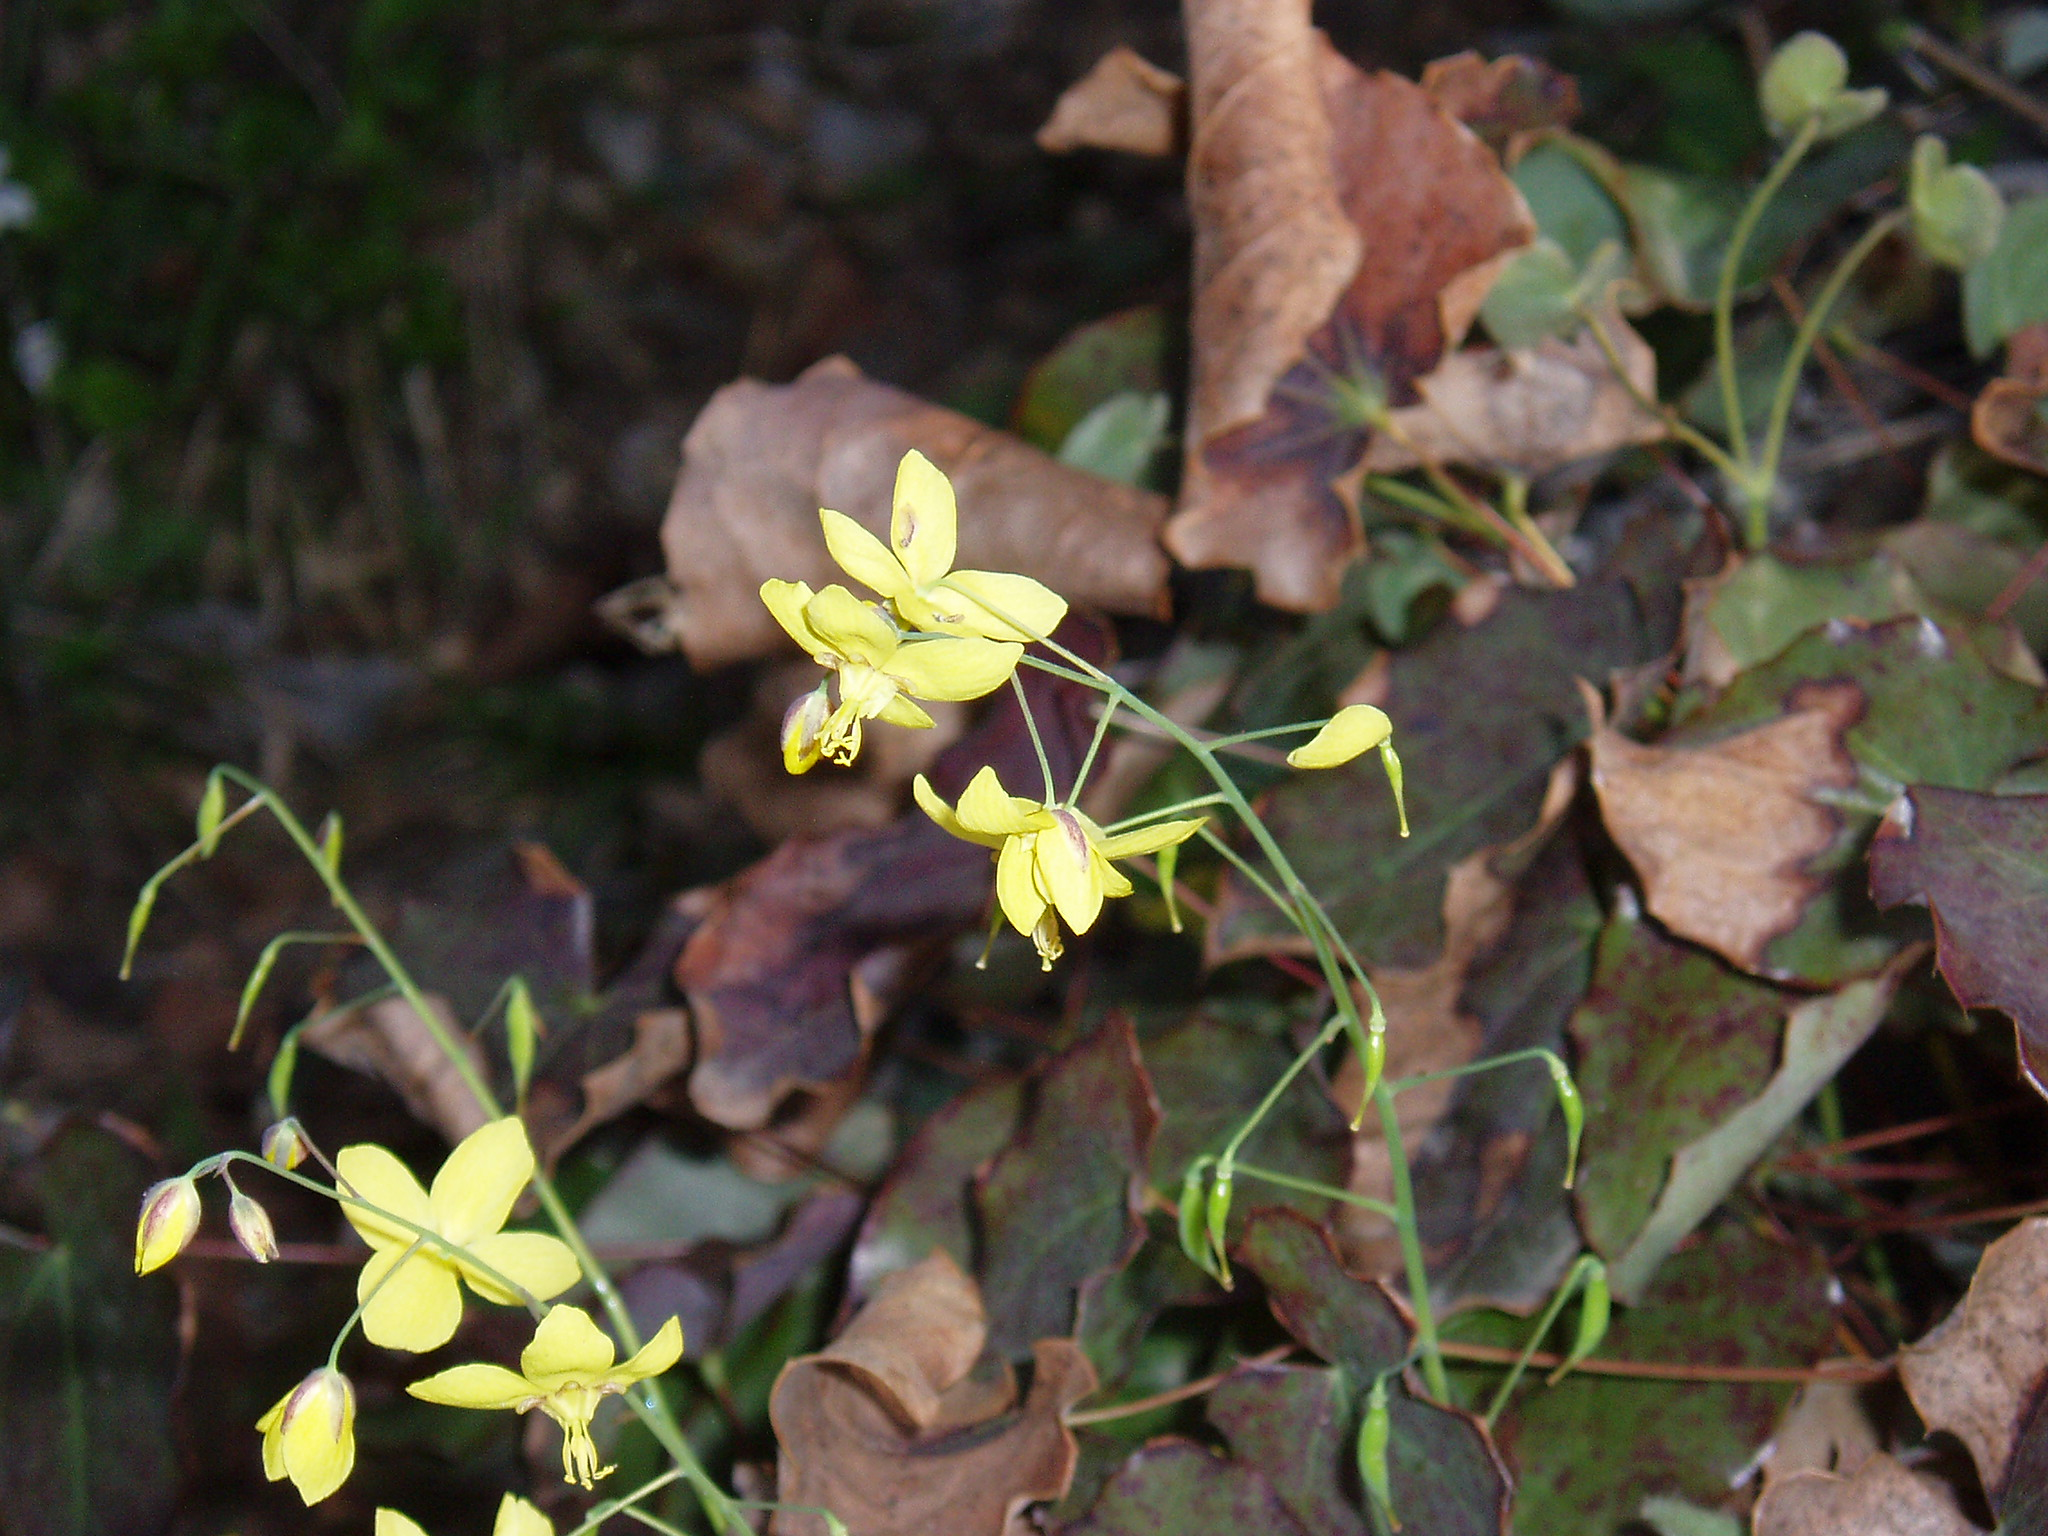 Mtirala National Park. Epimedium colchicum (Boiss.) Trautv. (Syn. Of Epimedium pinnatum subsp. colchicum (Boiss.) N. Busch) 04/2005 Photographer & Copyright: Shalva Sikharulidze